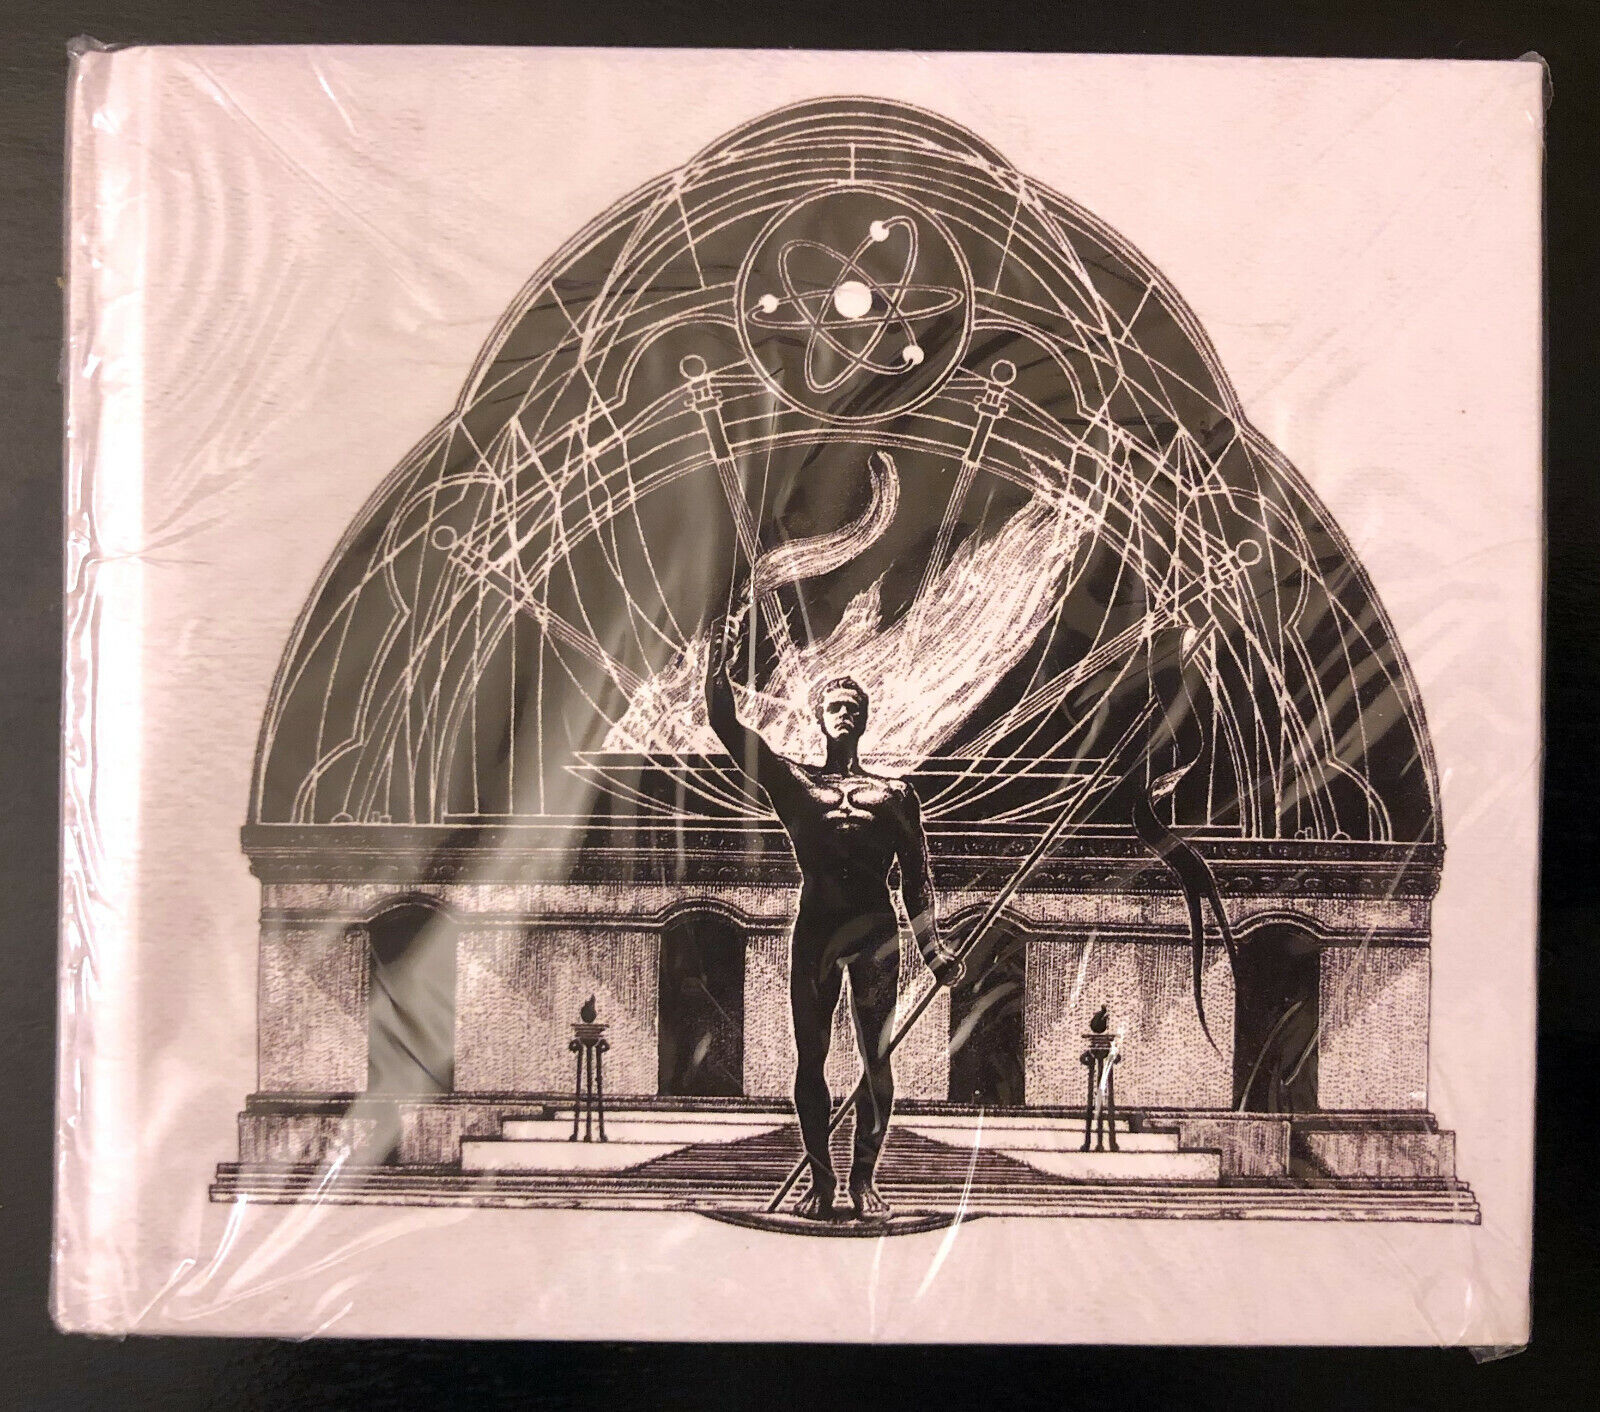 PUISSANCE 3CD Der Blutharsch Laibach Triarii Arditi Cold Meat Industry Toroidh - $49.99